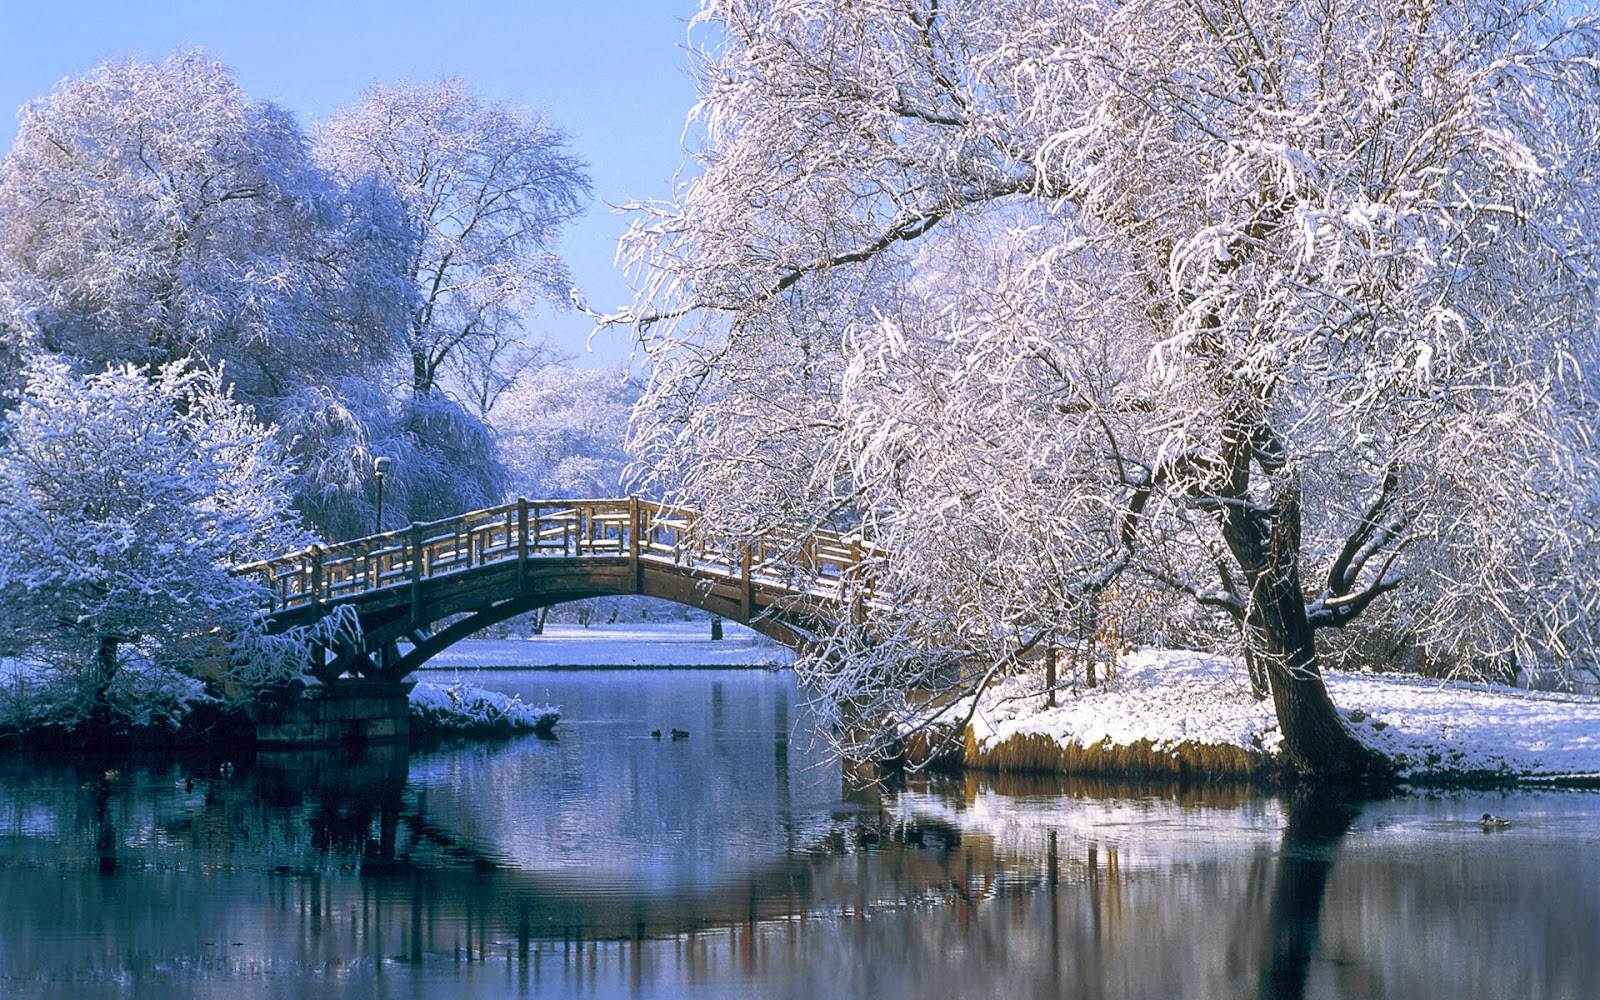 Beautiful-Scenery-Of-Winter-Season-Free-Hd-Wallpapers - Hd -5825